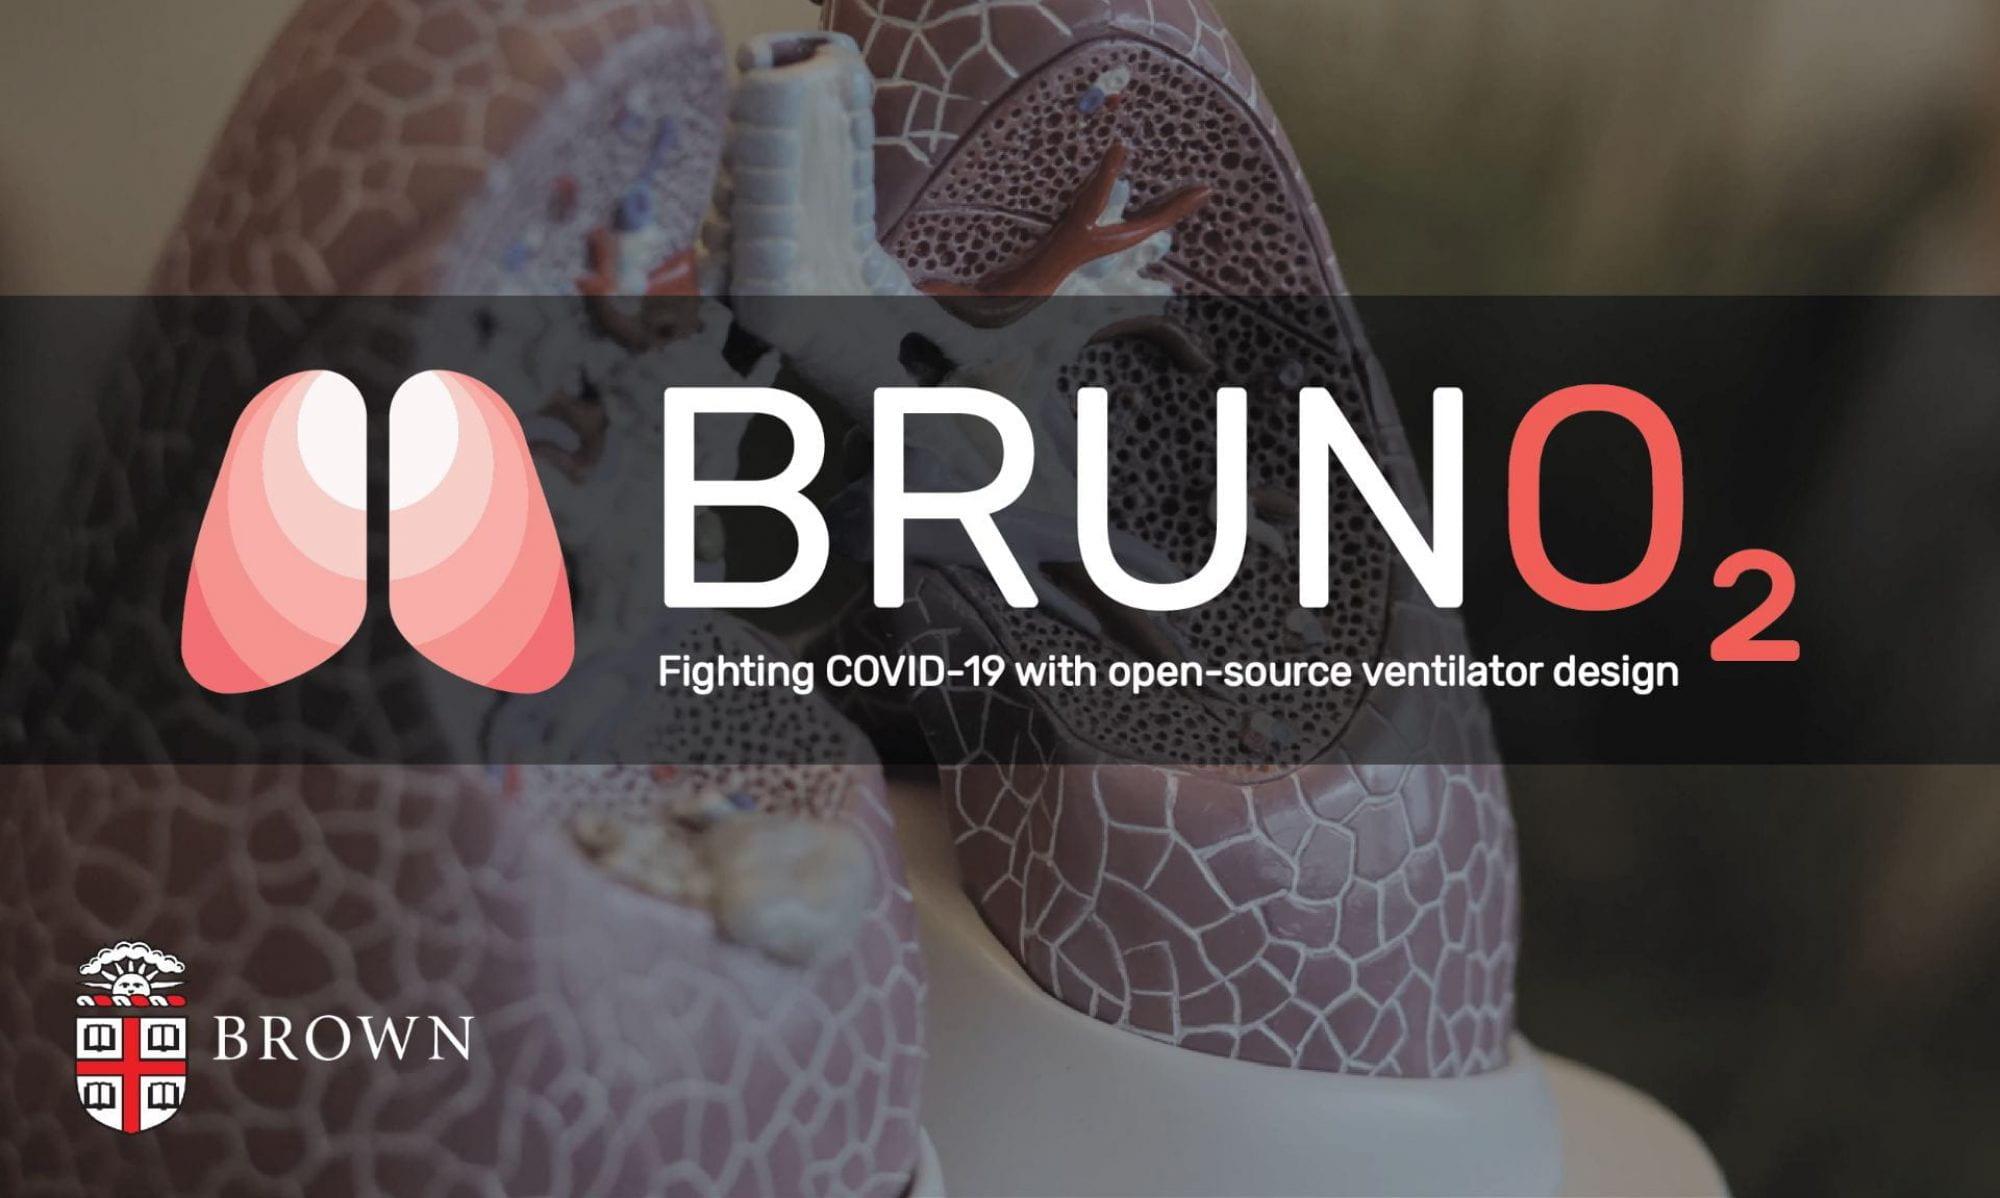 BRUNO2